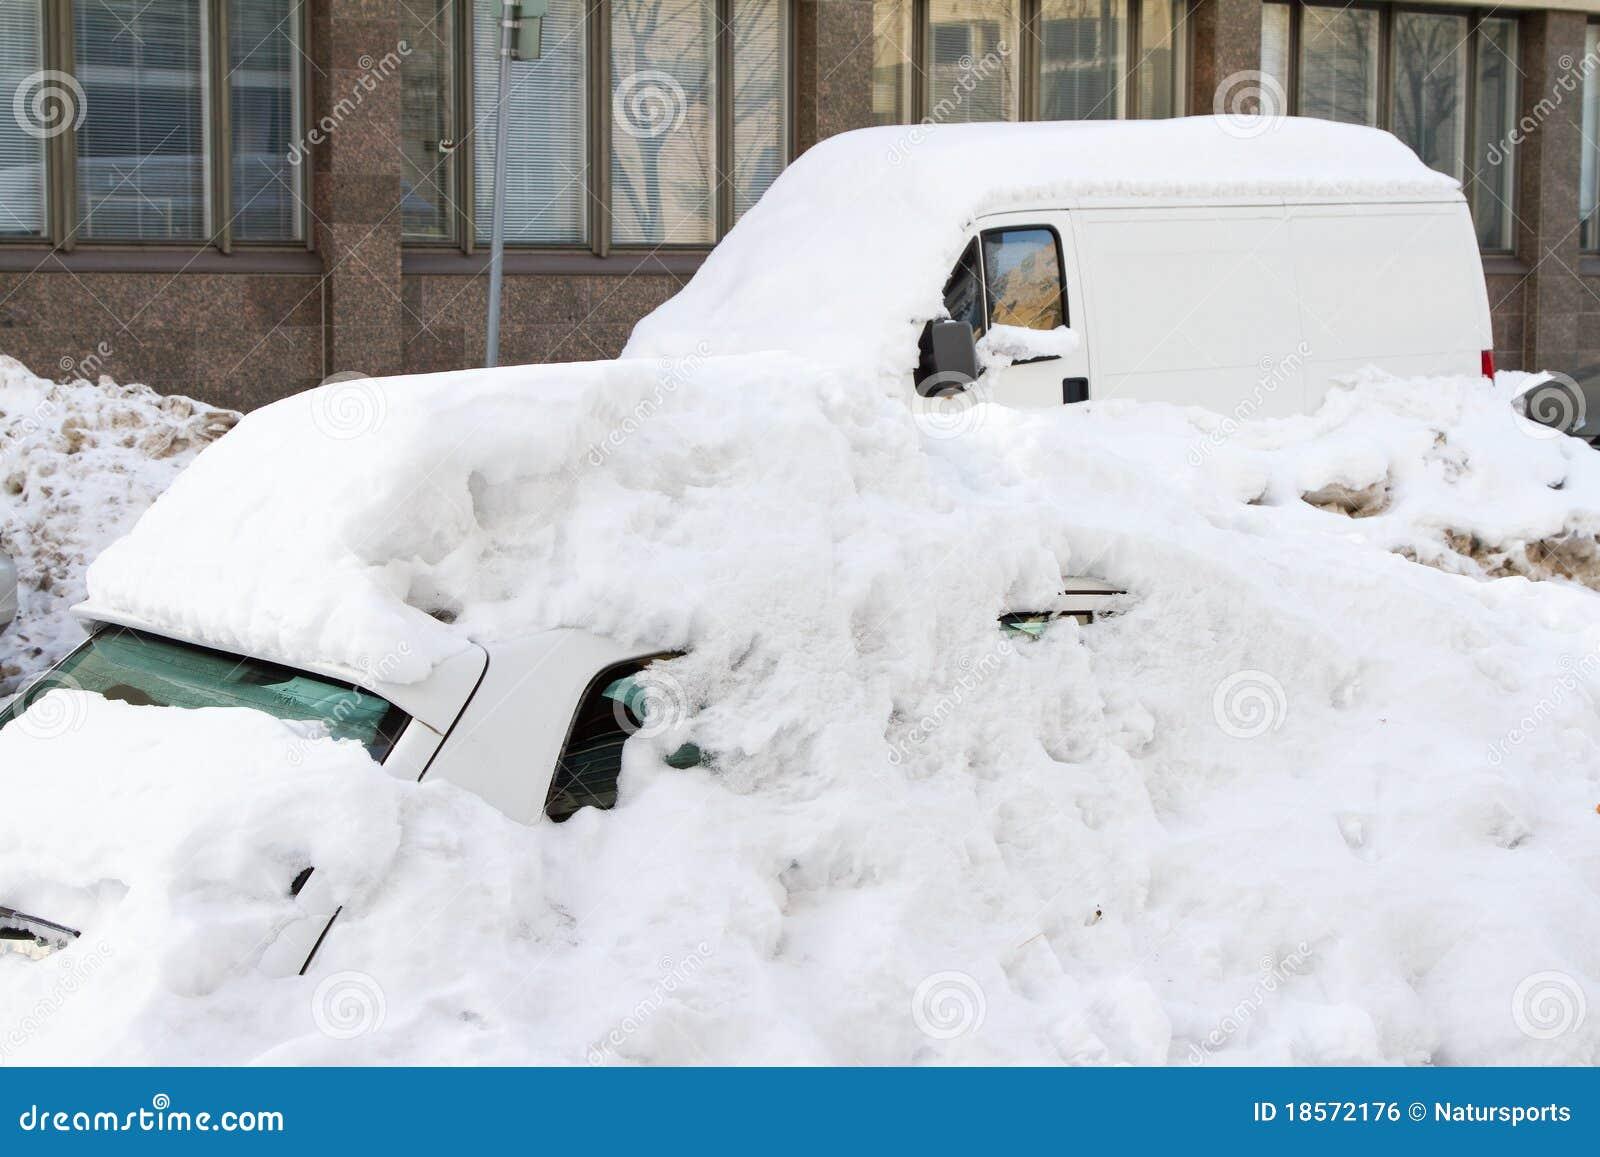 Finland helsinki snowfall